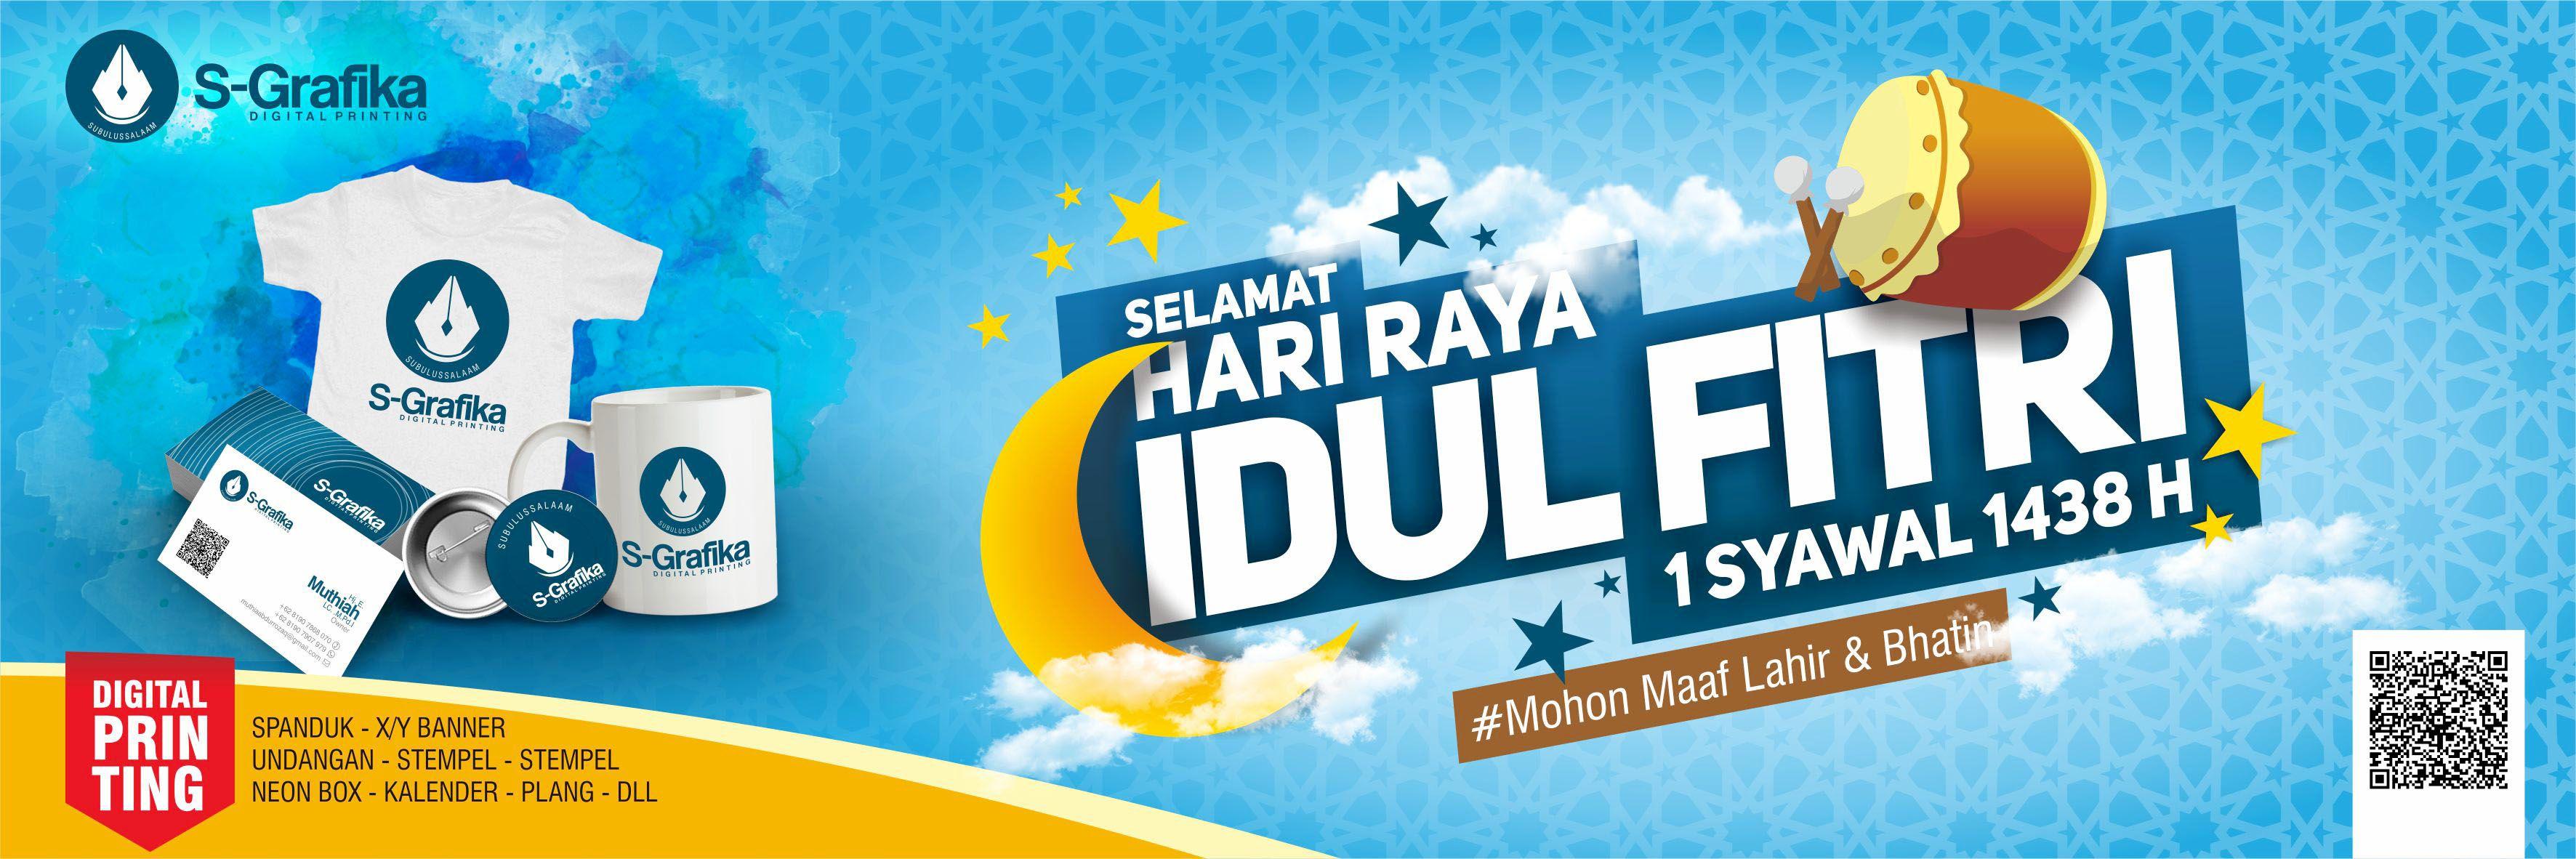 Spanduk Idul Fitri 1438 H Client S Grafika Desain Banner Spanduk Brosur